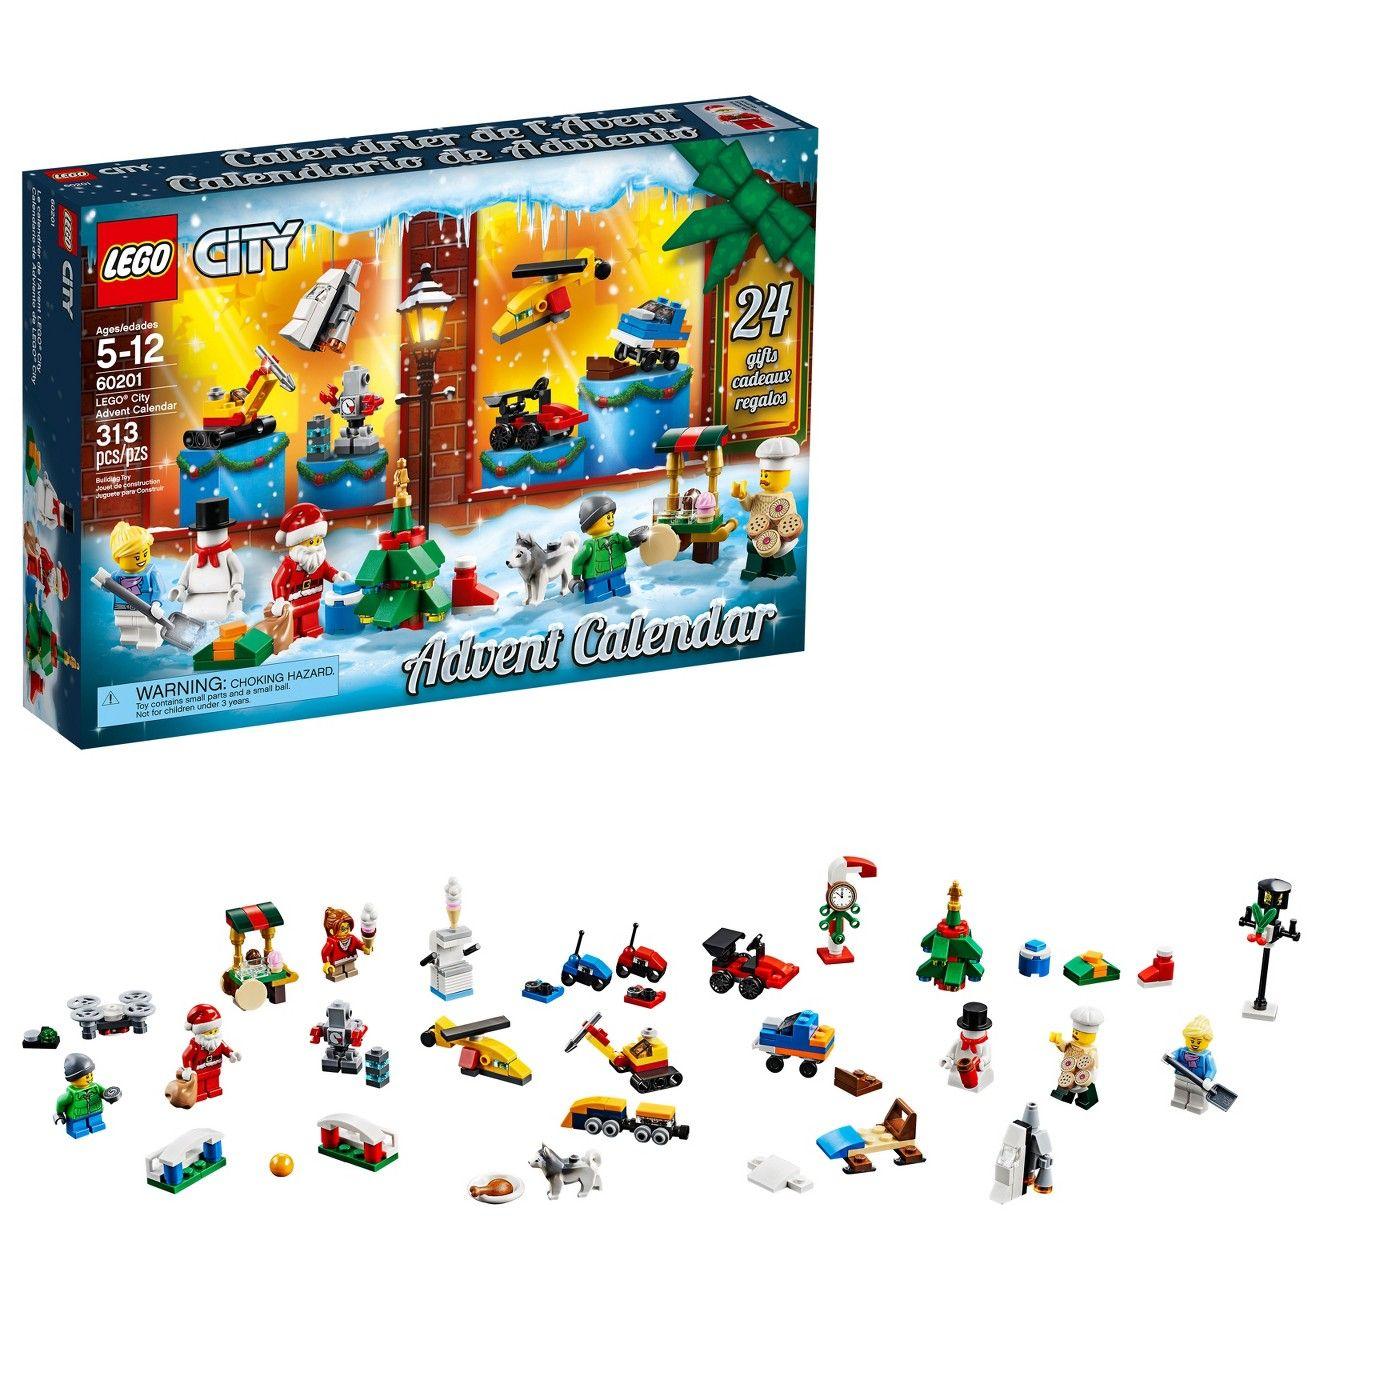 Mom Deal Lego City Advent Calendar At Target 23 99 Lego Advent Calendar Lego Advent Lego City Advent Calendar